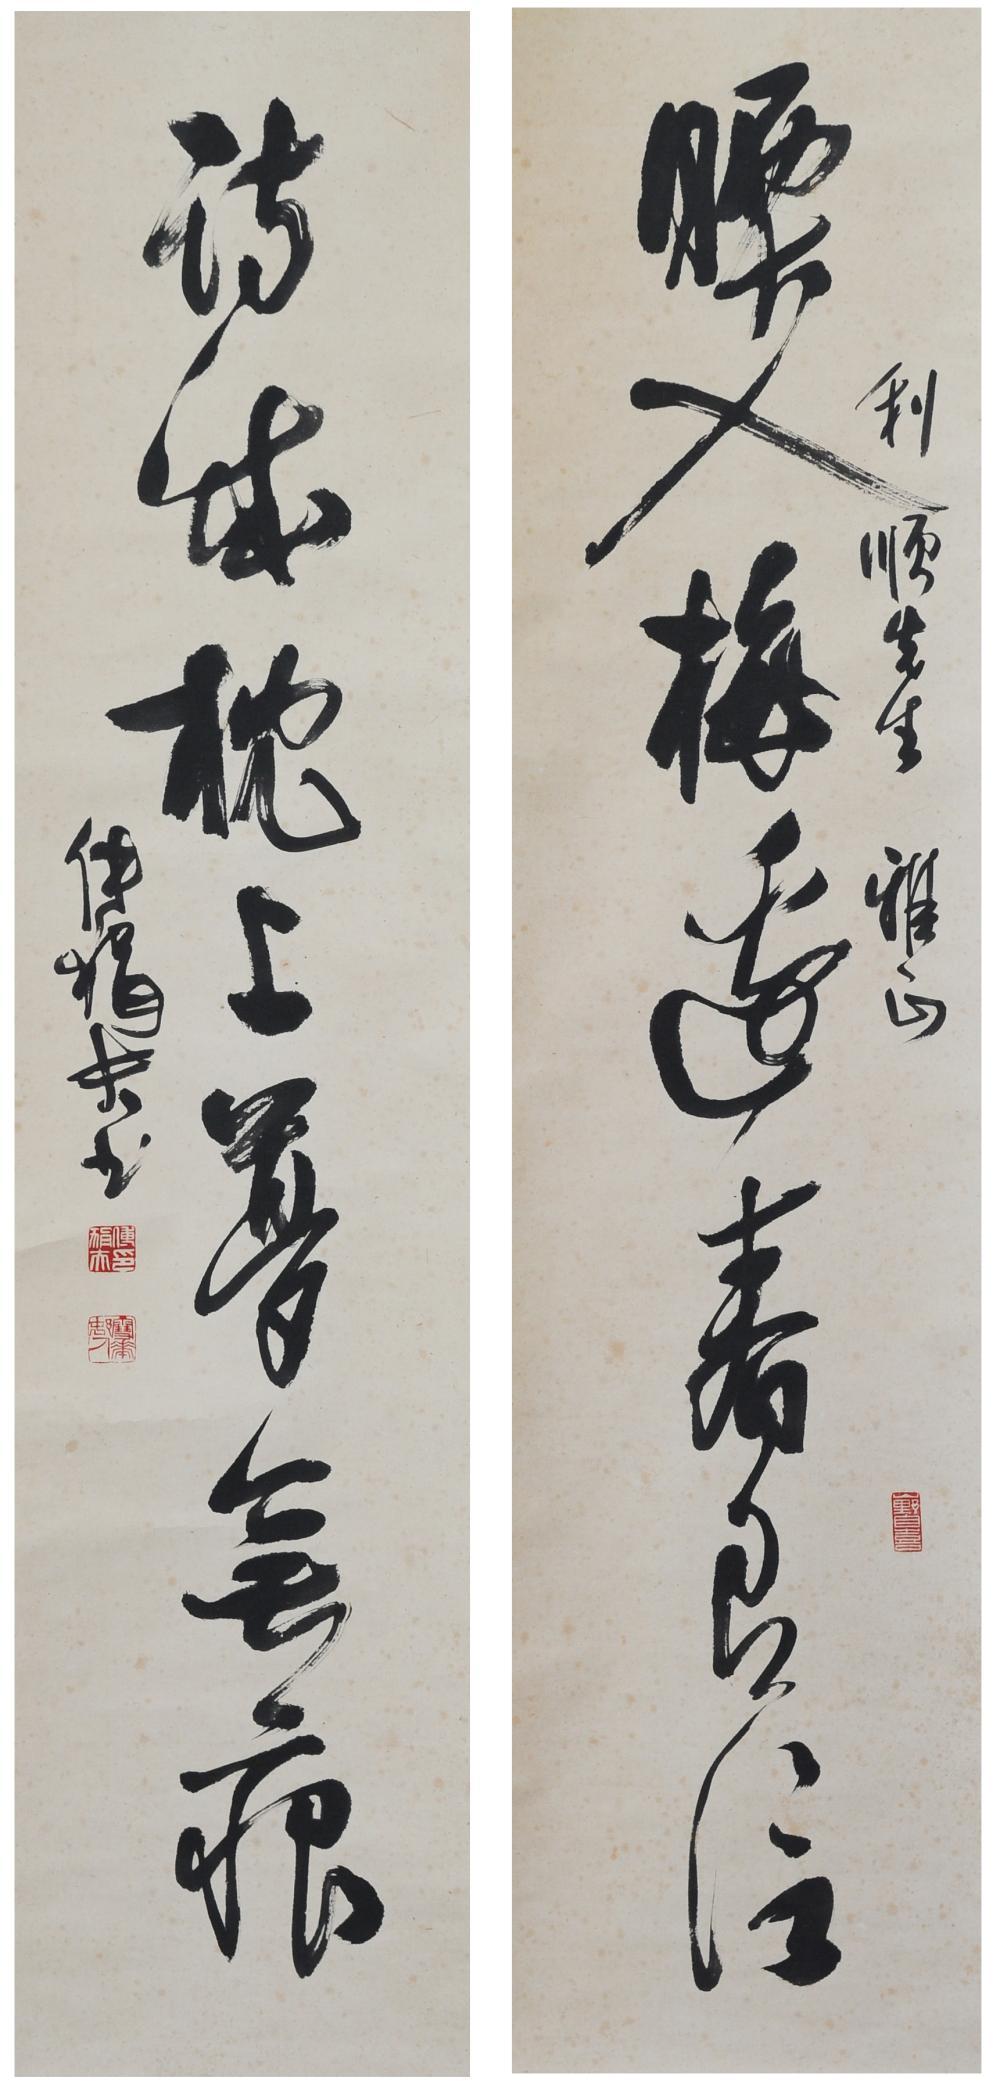 CALLIGRAPHY COUPLET BY FU JUANFU GIVEN TO LISHUN